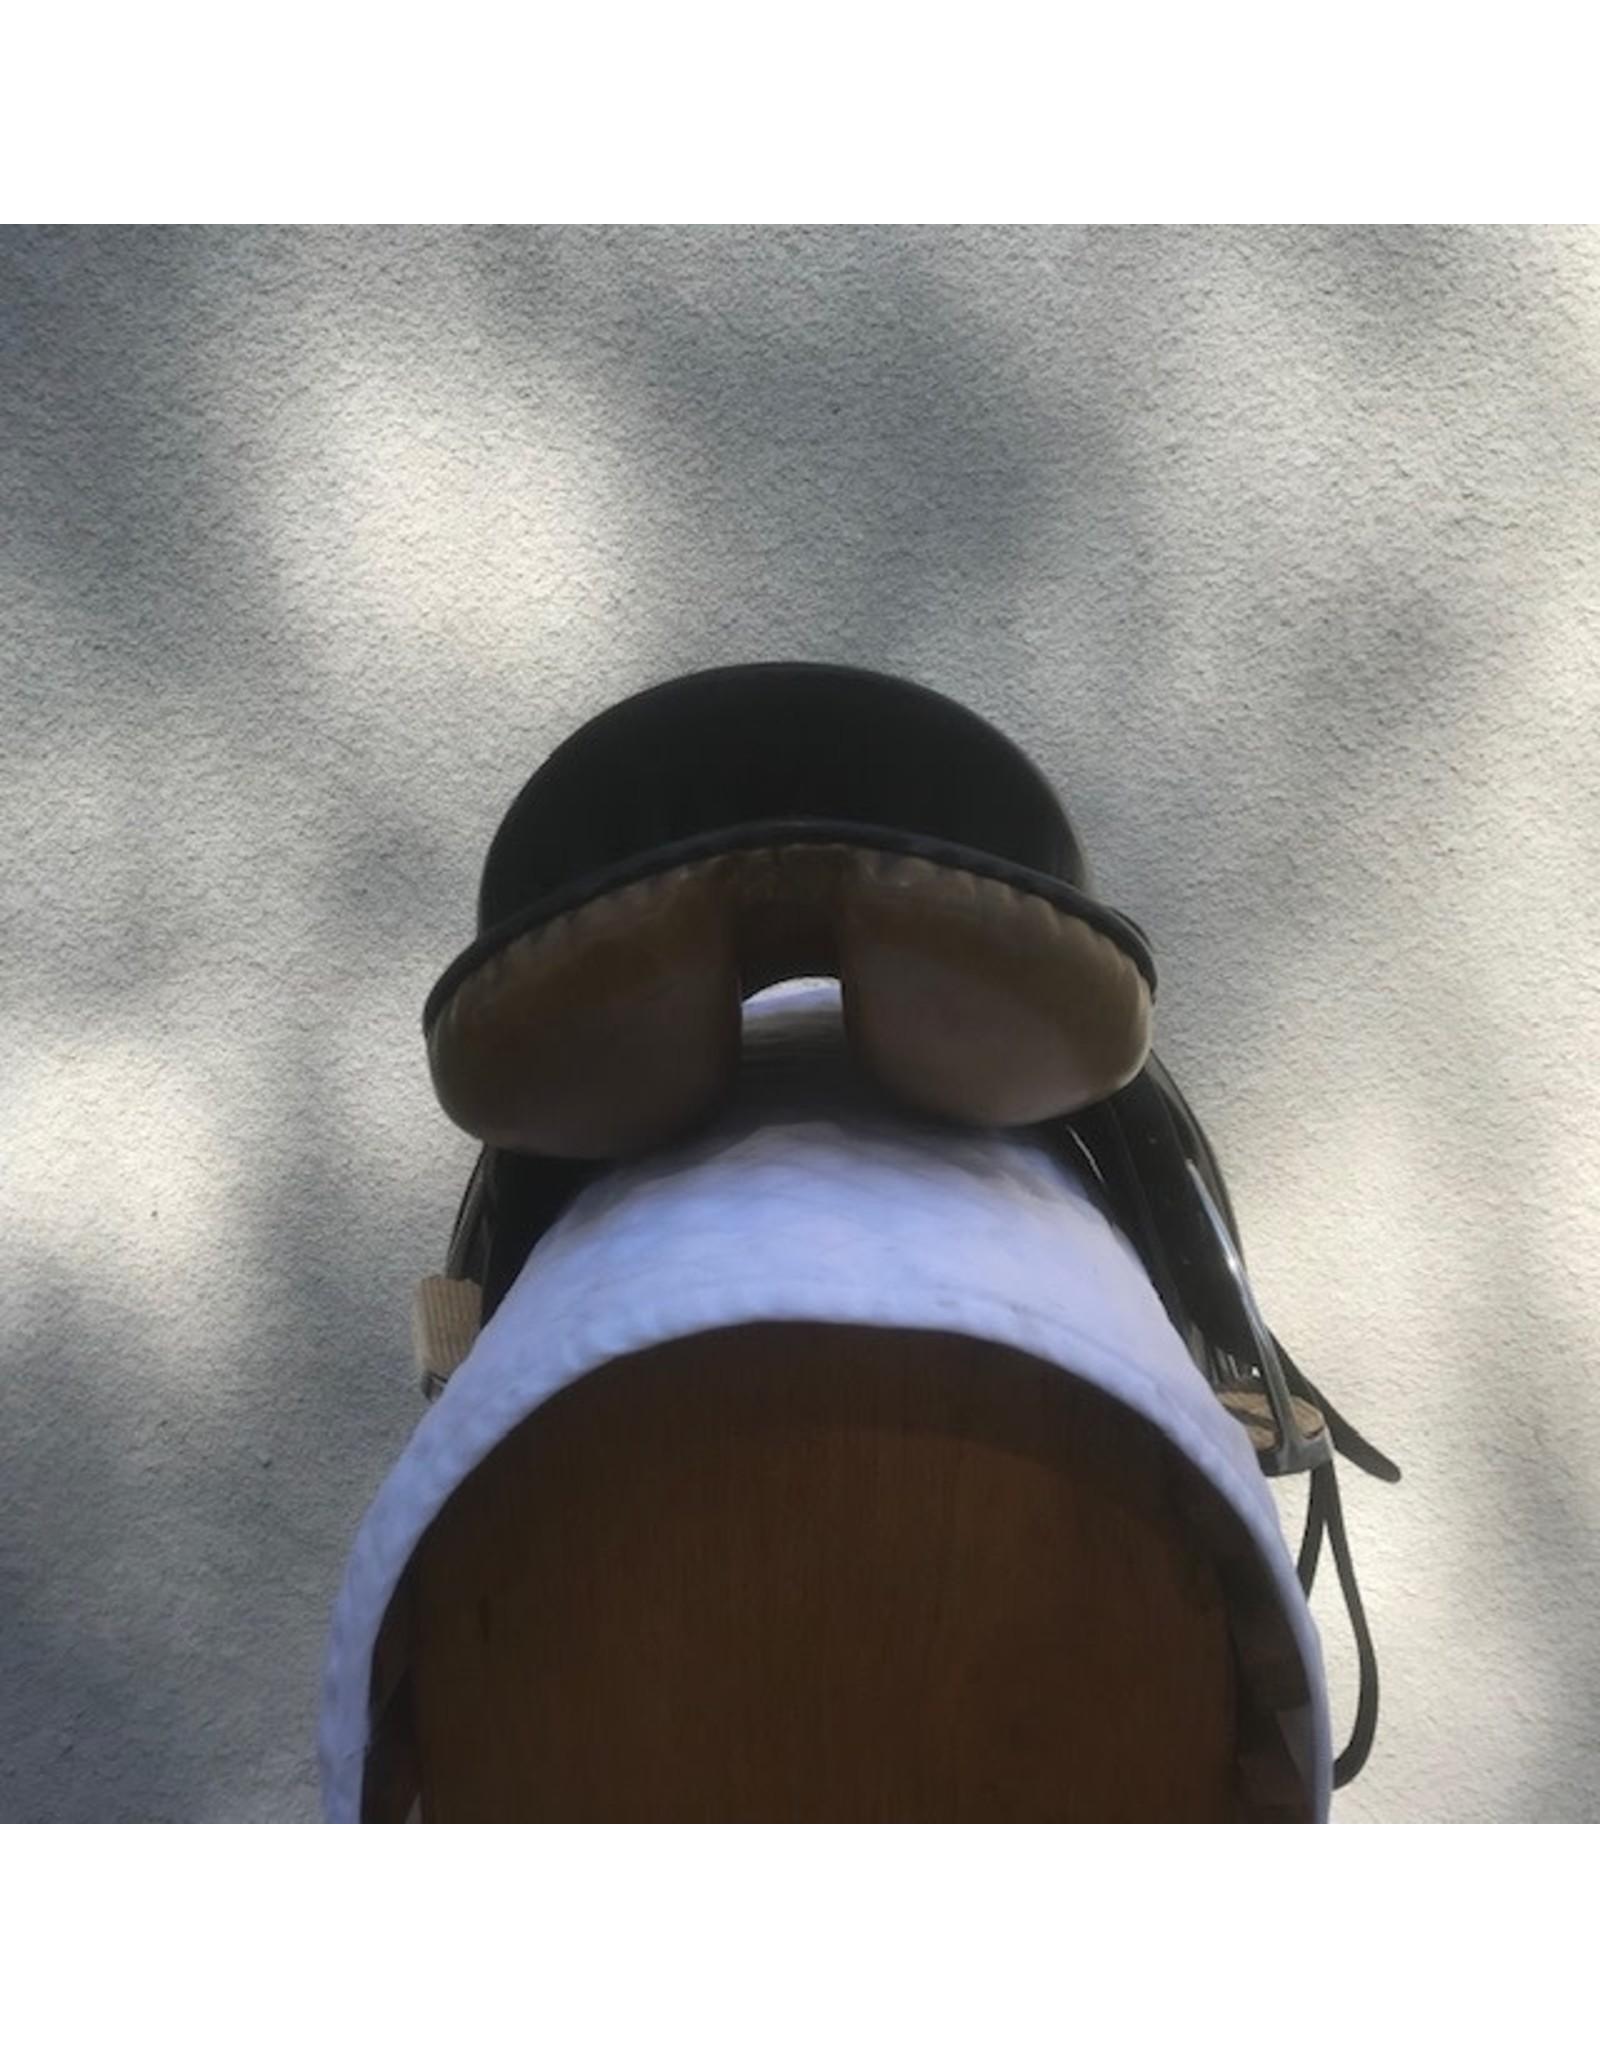 "Tony Slatter 17"" Med with stirrups and leathers"